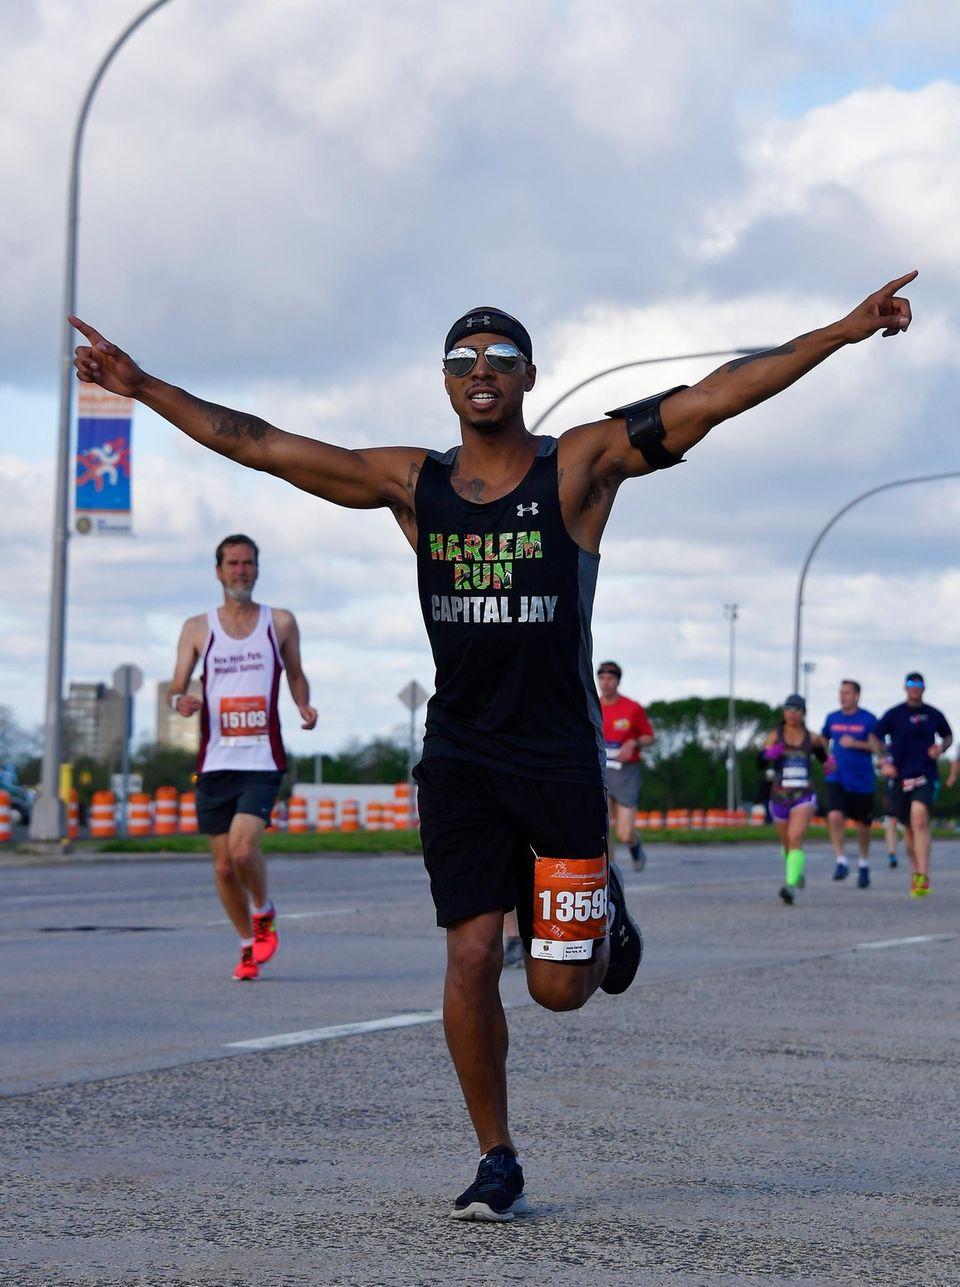 Jason Carrol, 35, of Manhattan, runs the half-marathon